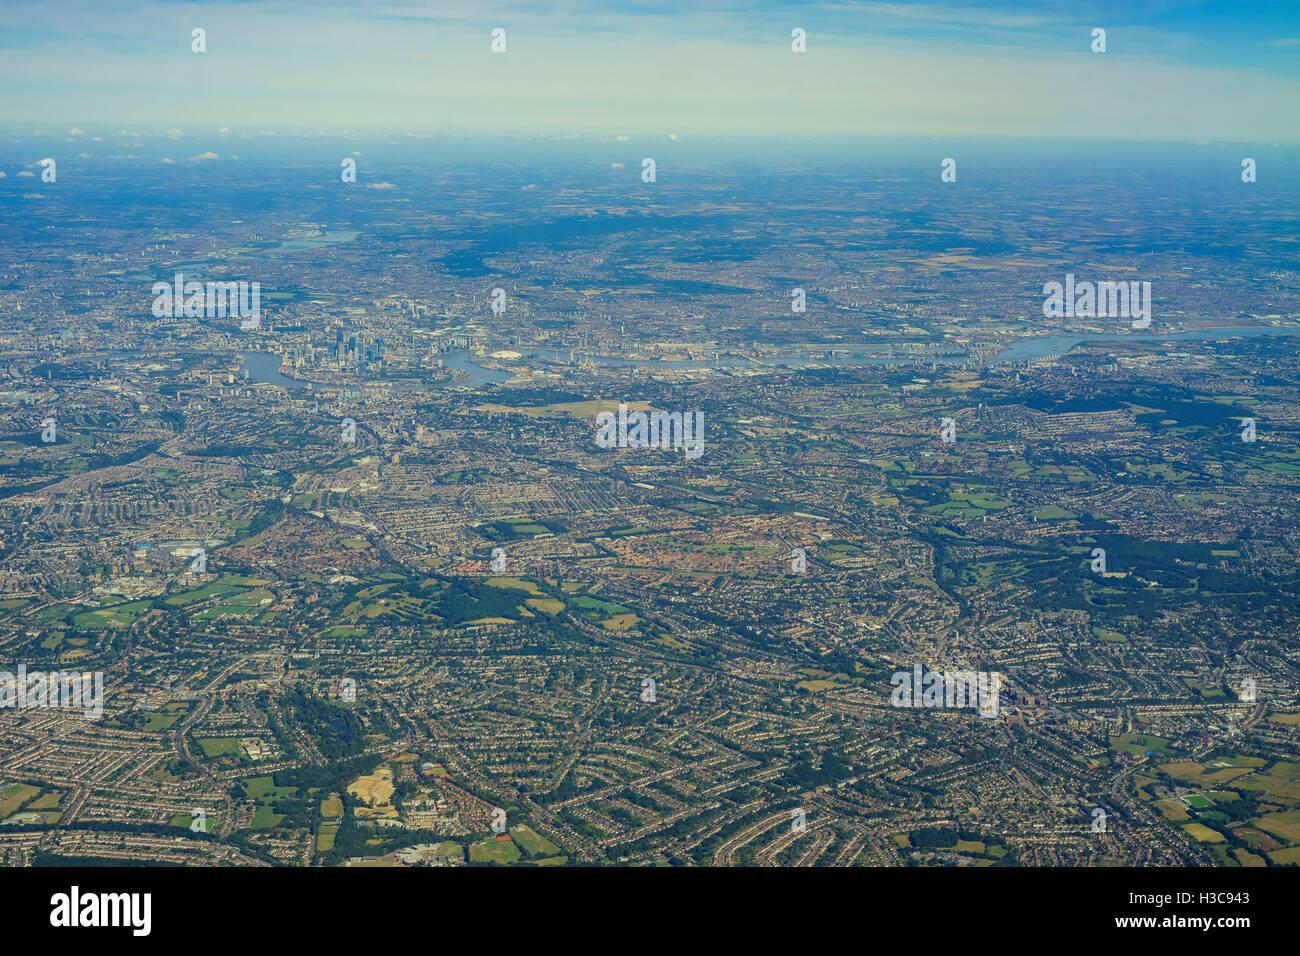 Aerial View of Downham, Bromley, Shortlands, Eden Park, Park Langley in morning, United Kingdom - Stock Image